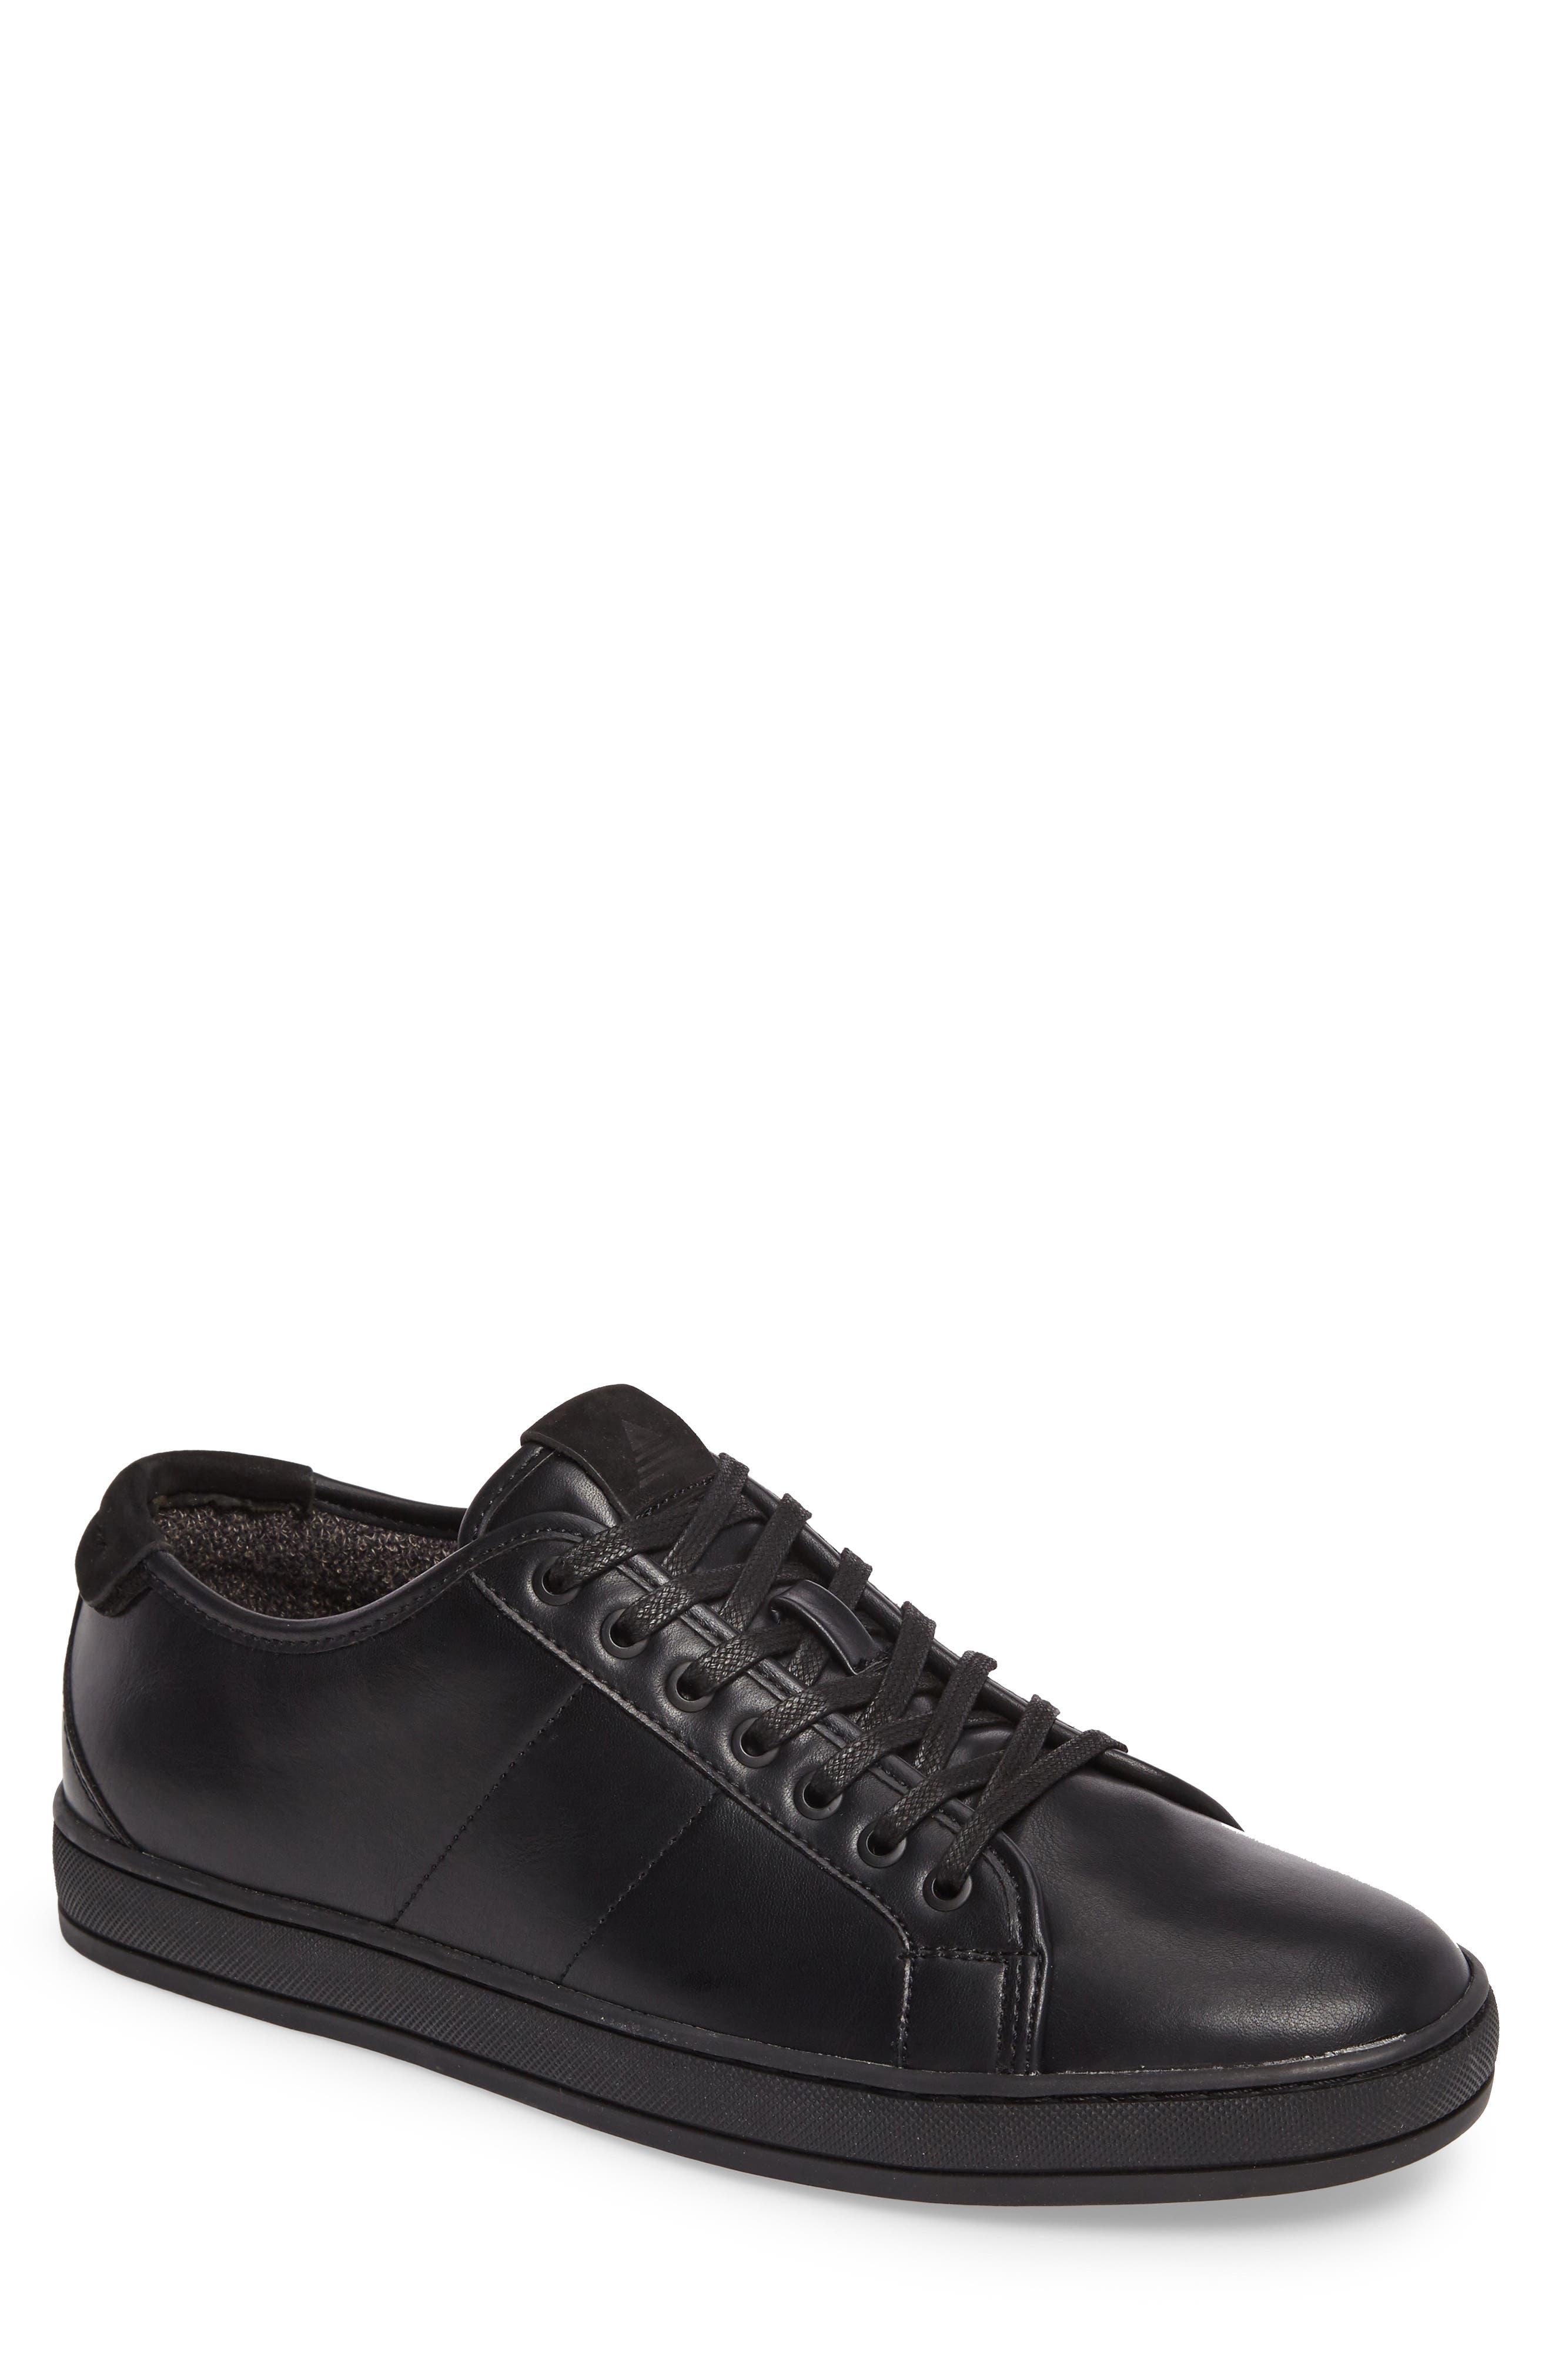 Alternate Image 1 Selected - ALDO Delello Low-Top Sneaker (Men)